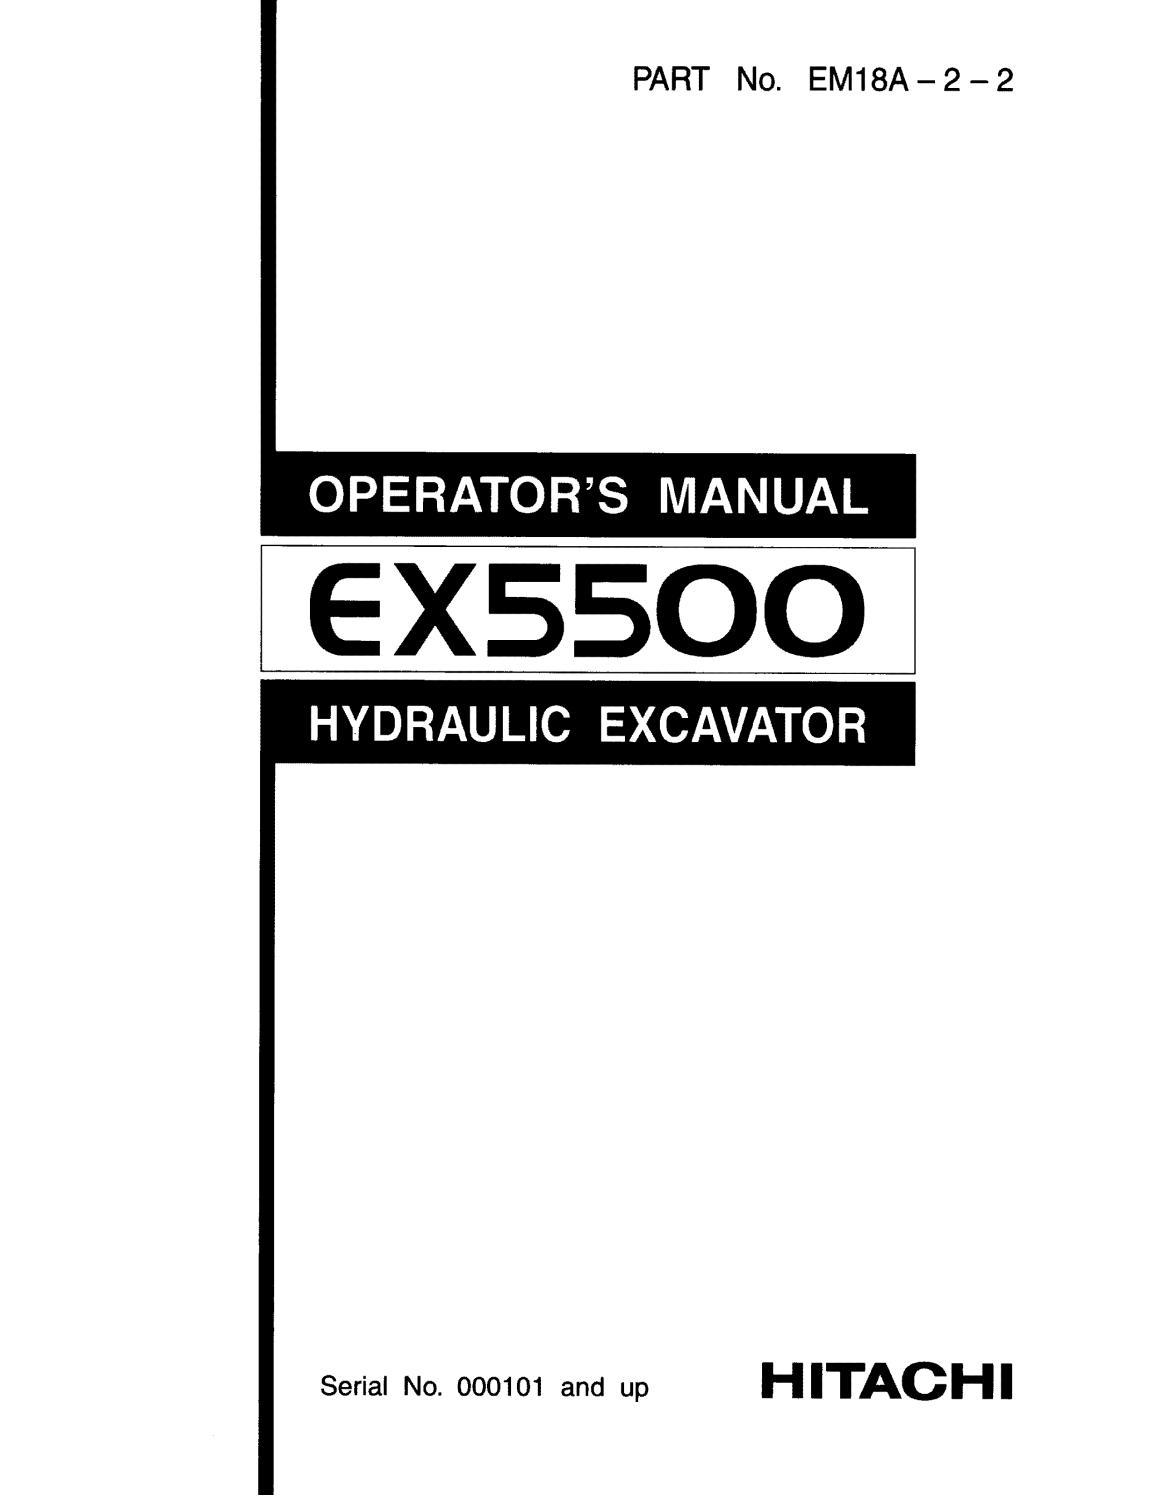 Hitachi EX5500 Hydraulic Excavator operator's manual